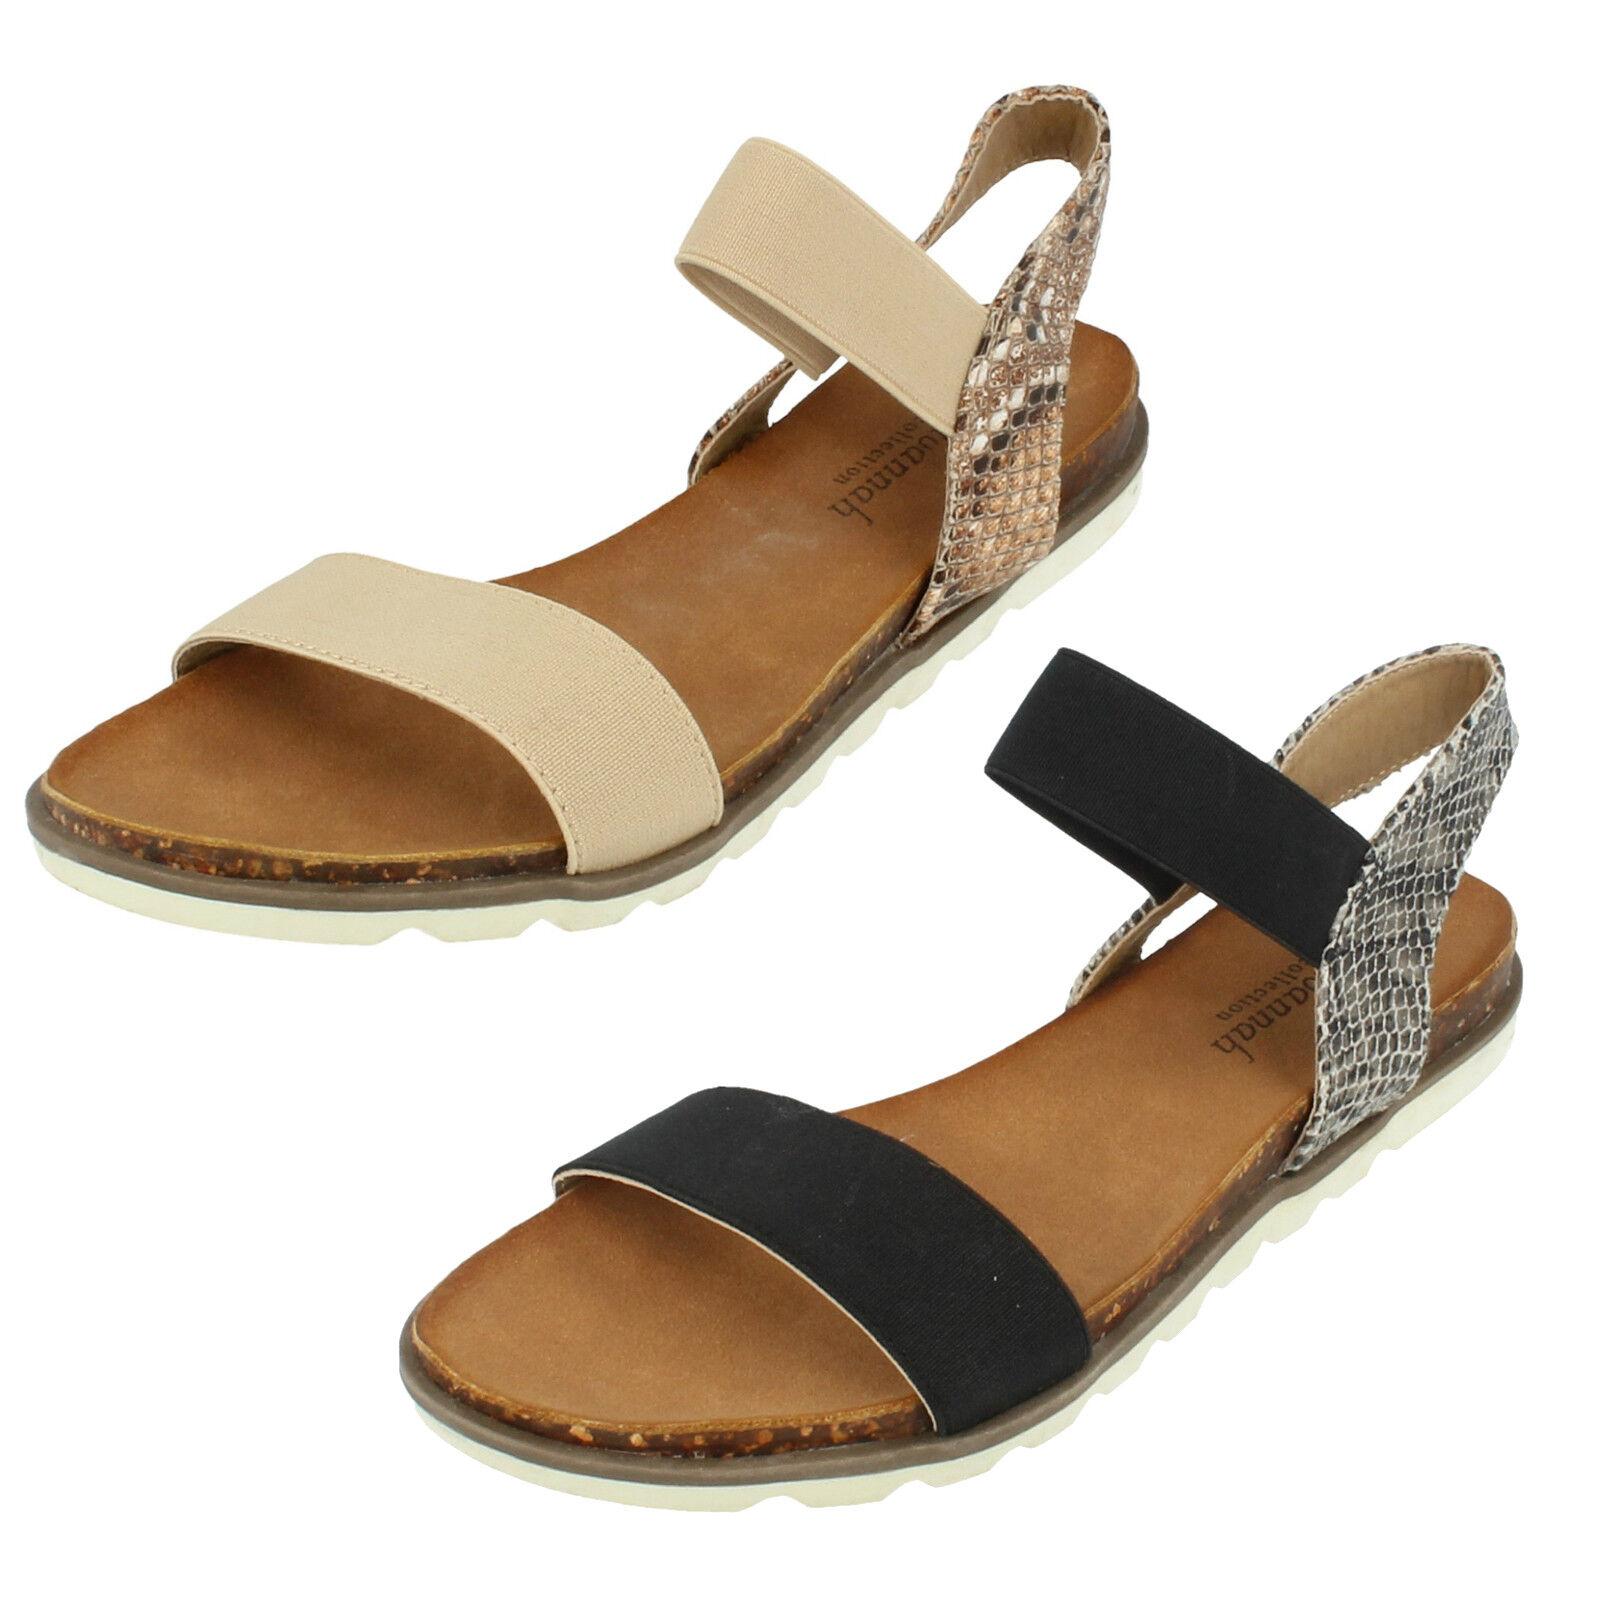 SALE NOW Ladies Savannah F0872 open toe sandals style F0872 Savannah 370dfd